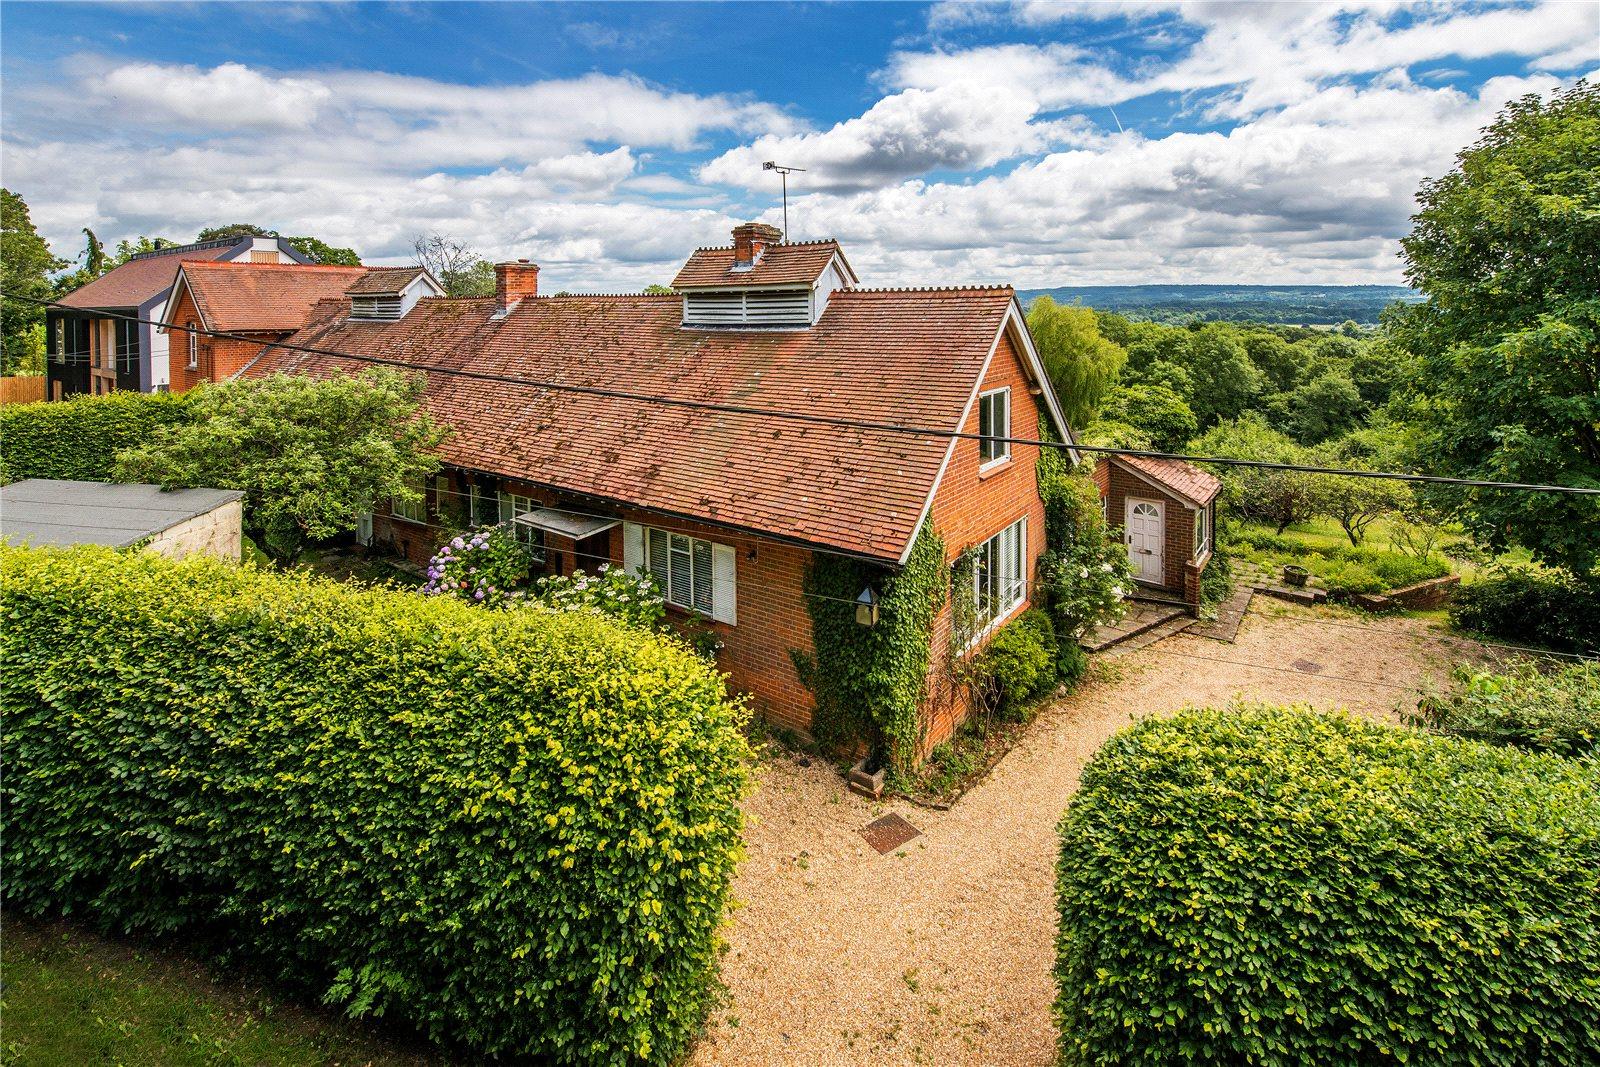 Casa para uma família para Venda às Summerfield Lane, Frensham, Farnham, Surrey, GU10 Farnham, Inglaterra